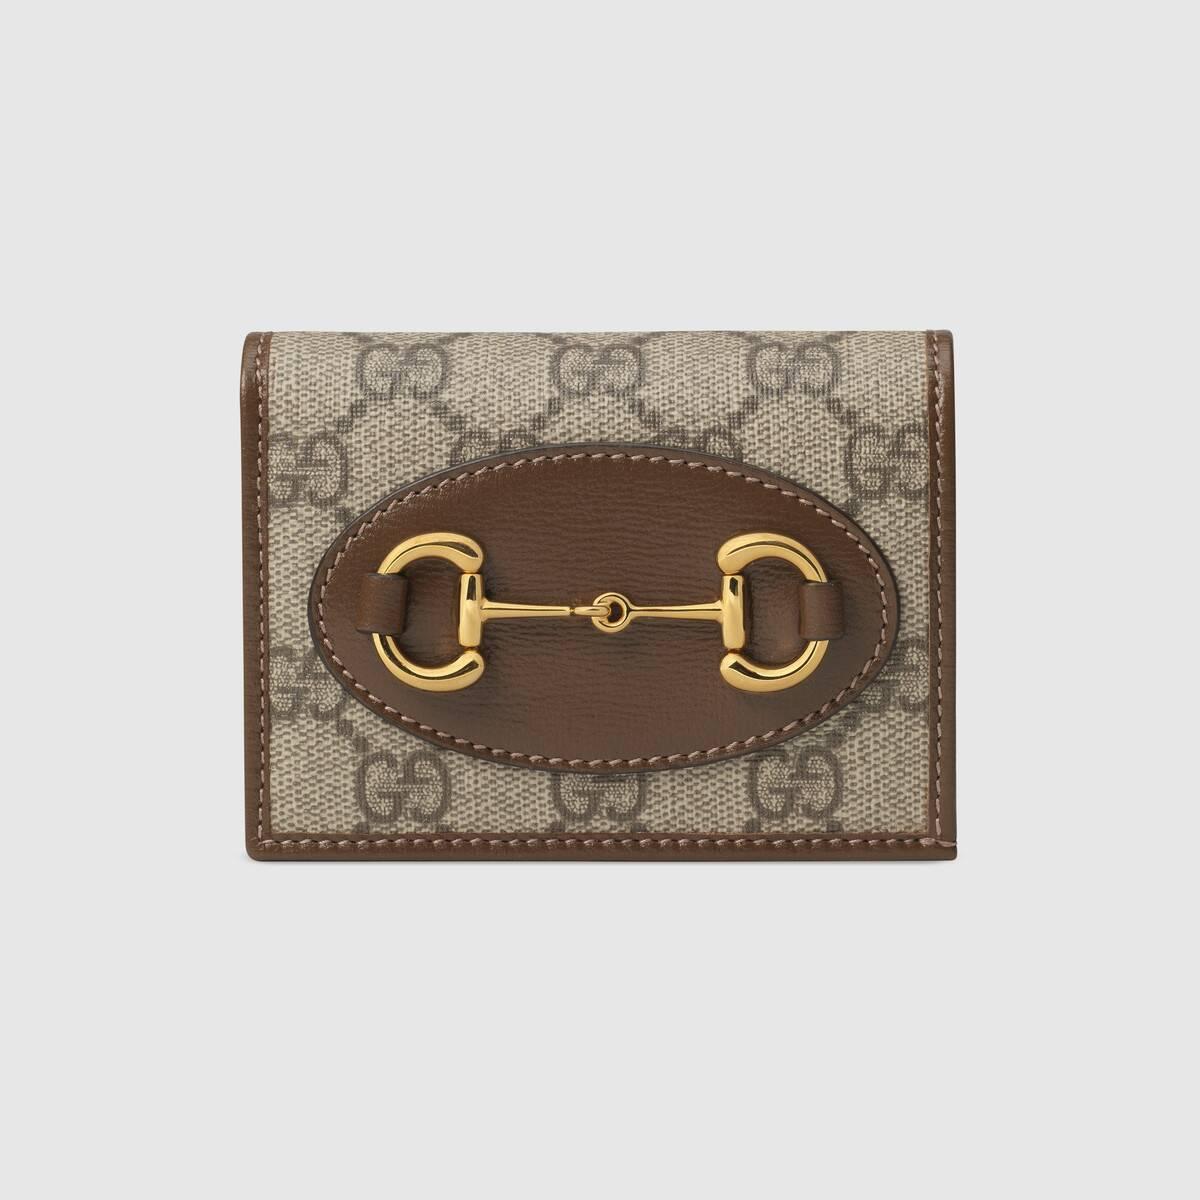 621887_92TCG_8563_001_080_0000_Light-Gucci-Horsebit-1955-card-case-wallet.jpg